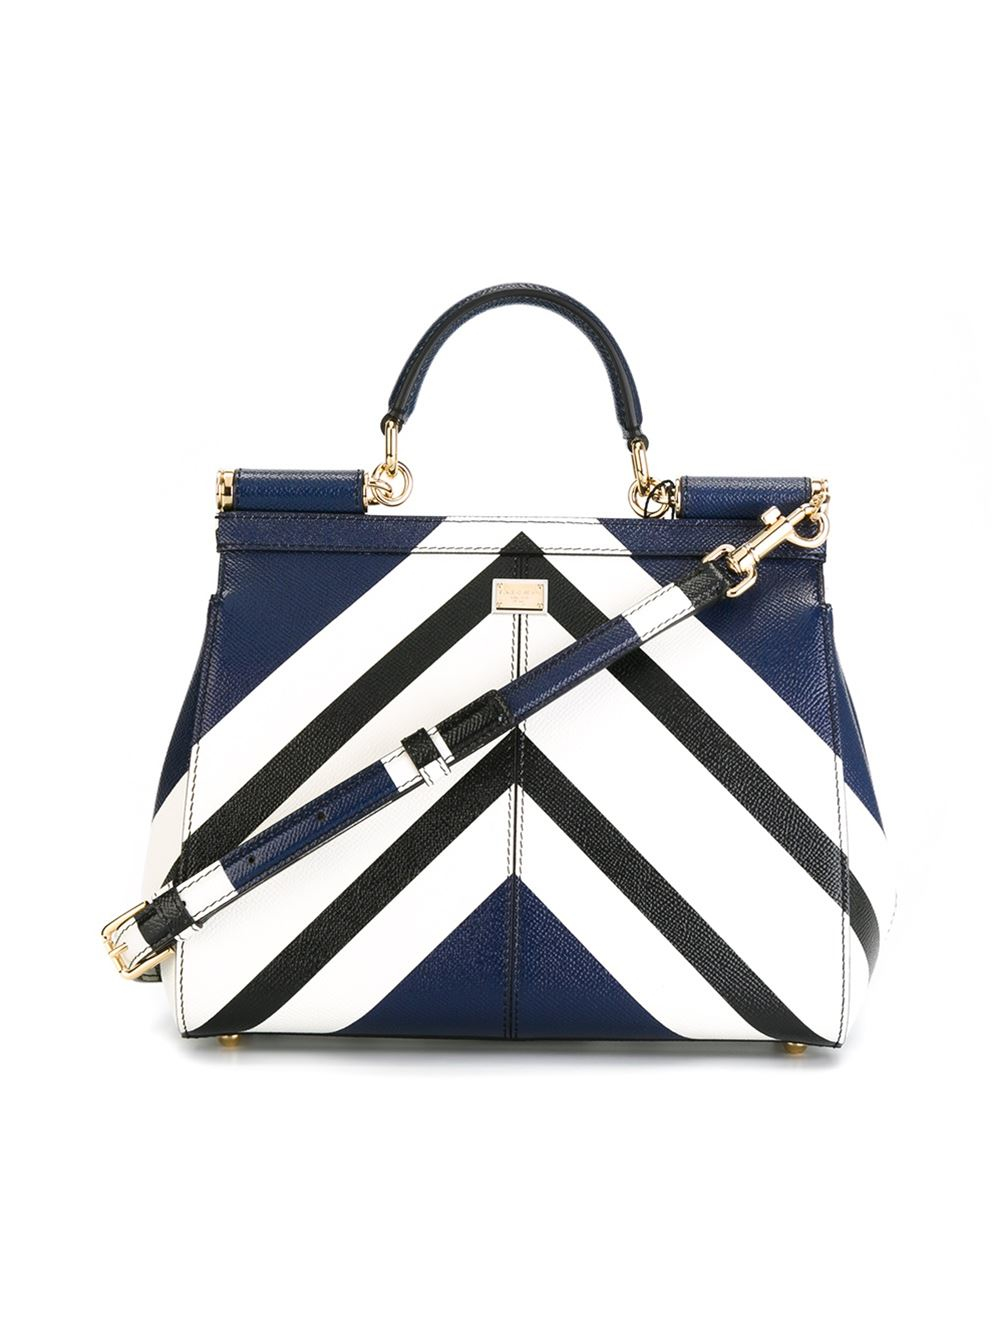 639bdc3d2 Dolce & Gabbana Striped Print Miss Sicily Medium Handbag in Blue - Lyst